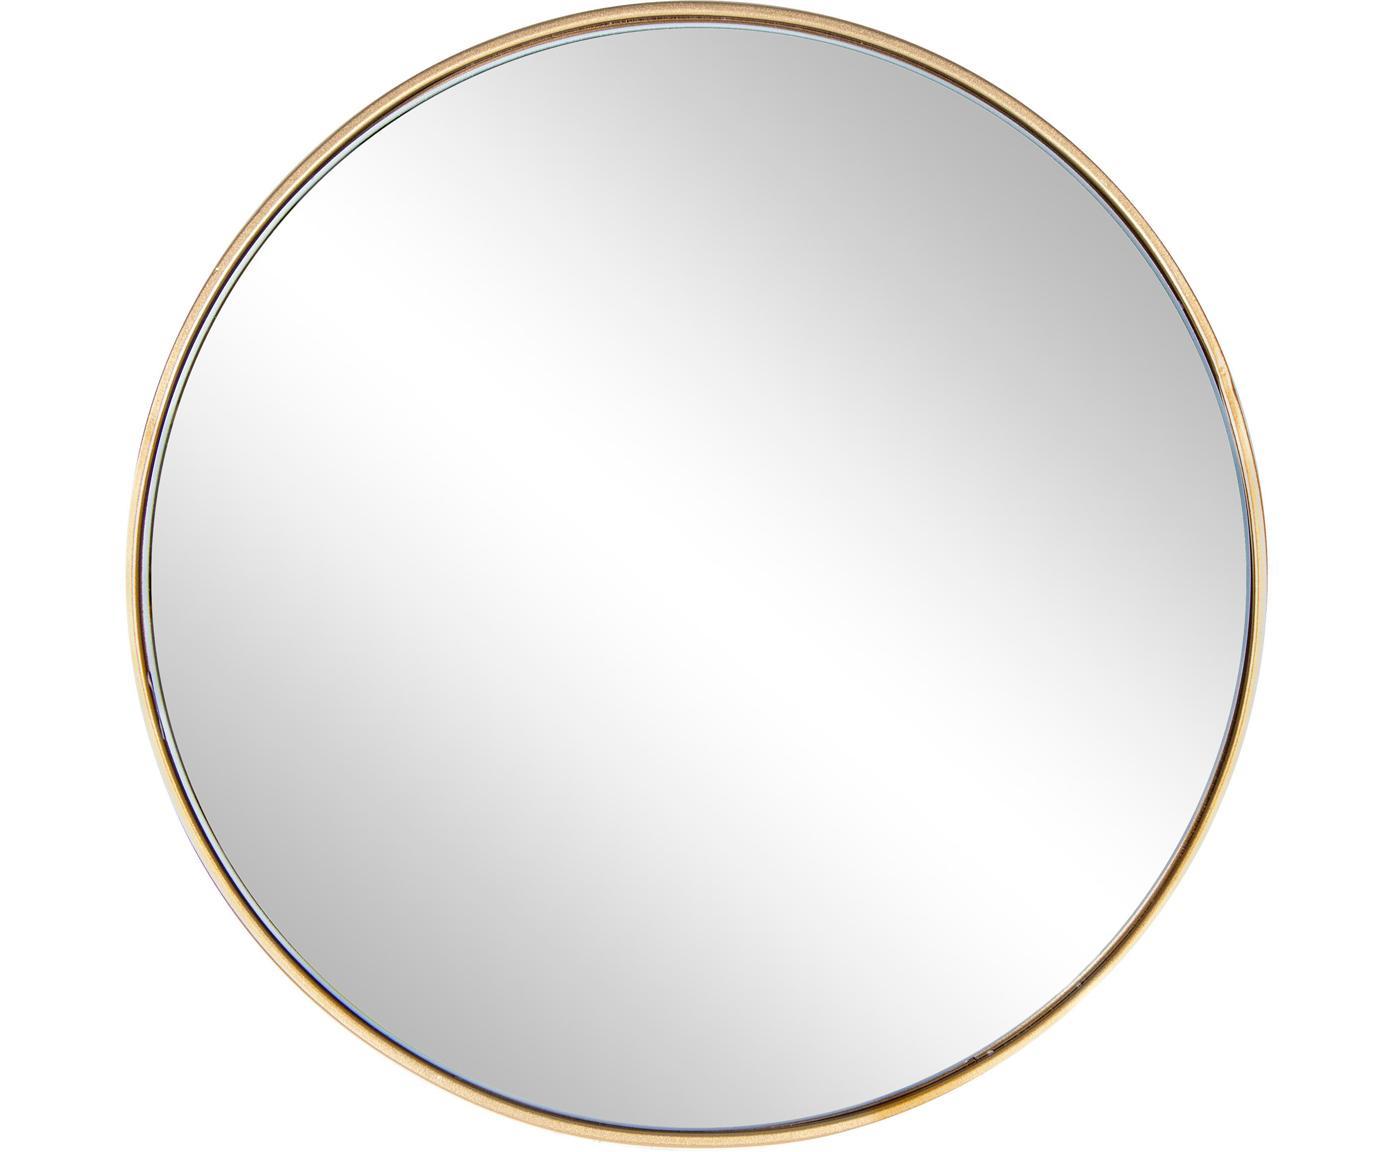 Wandspiegel Nucleos, Rahmen: Metall, beschichtet, Spiegelfläche: Spiegelglas, Messingfarben, Ø 40 cm